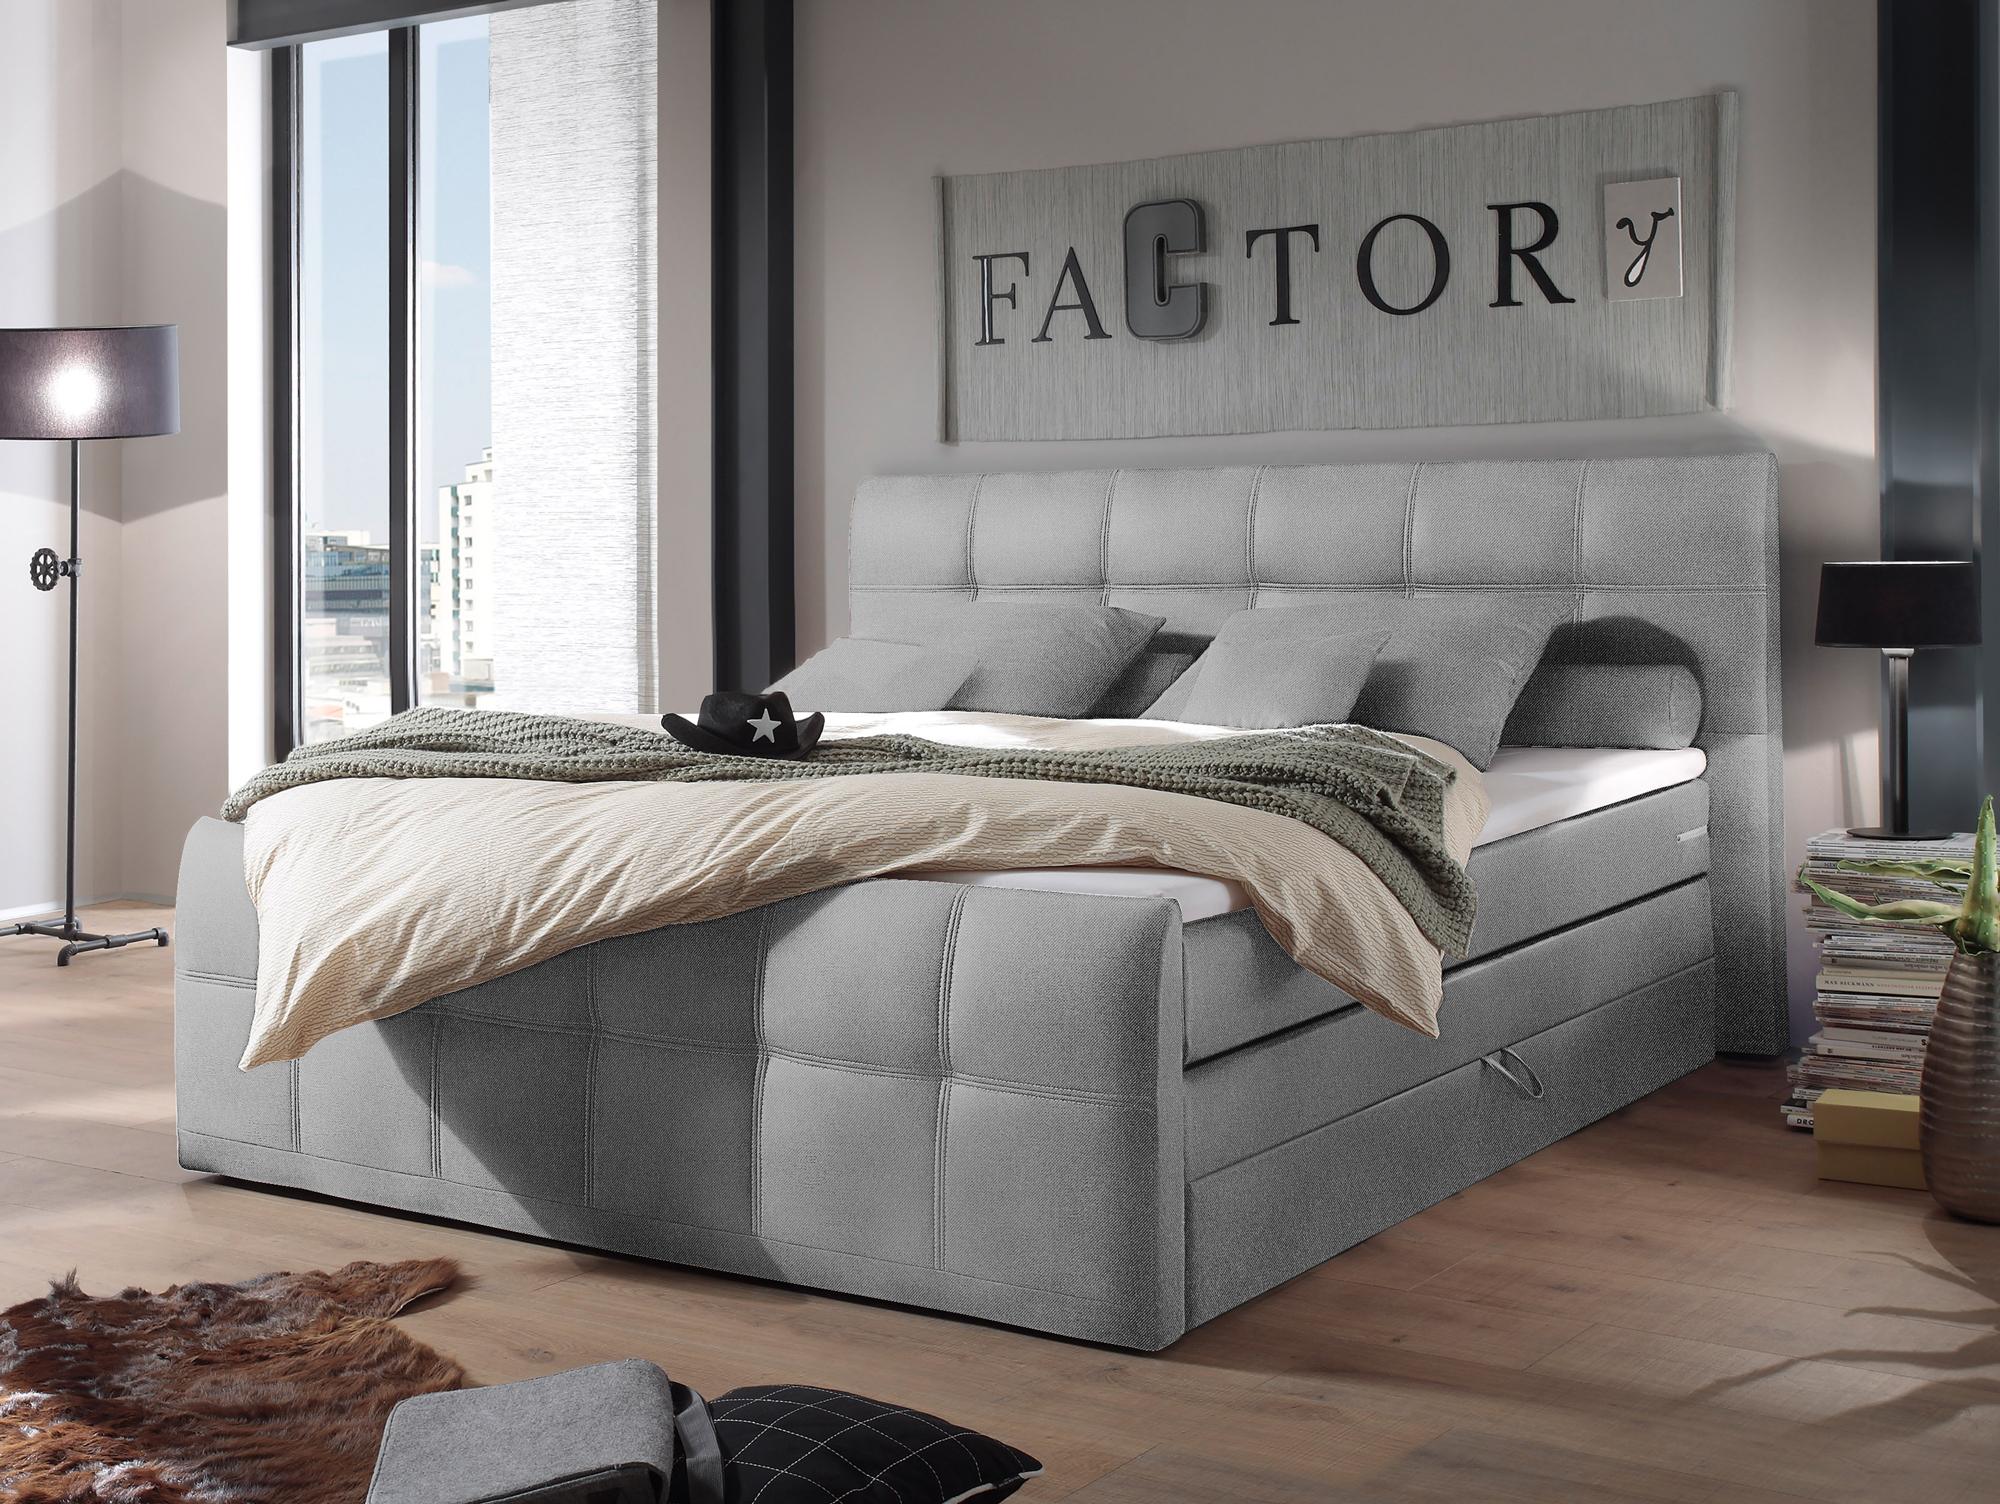 samara boxspringbett integrierter bettkasten 180x200 cm grau. Black Bedroom Furniture Sets. Home Design Ideas